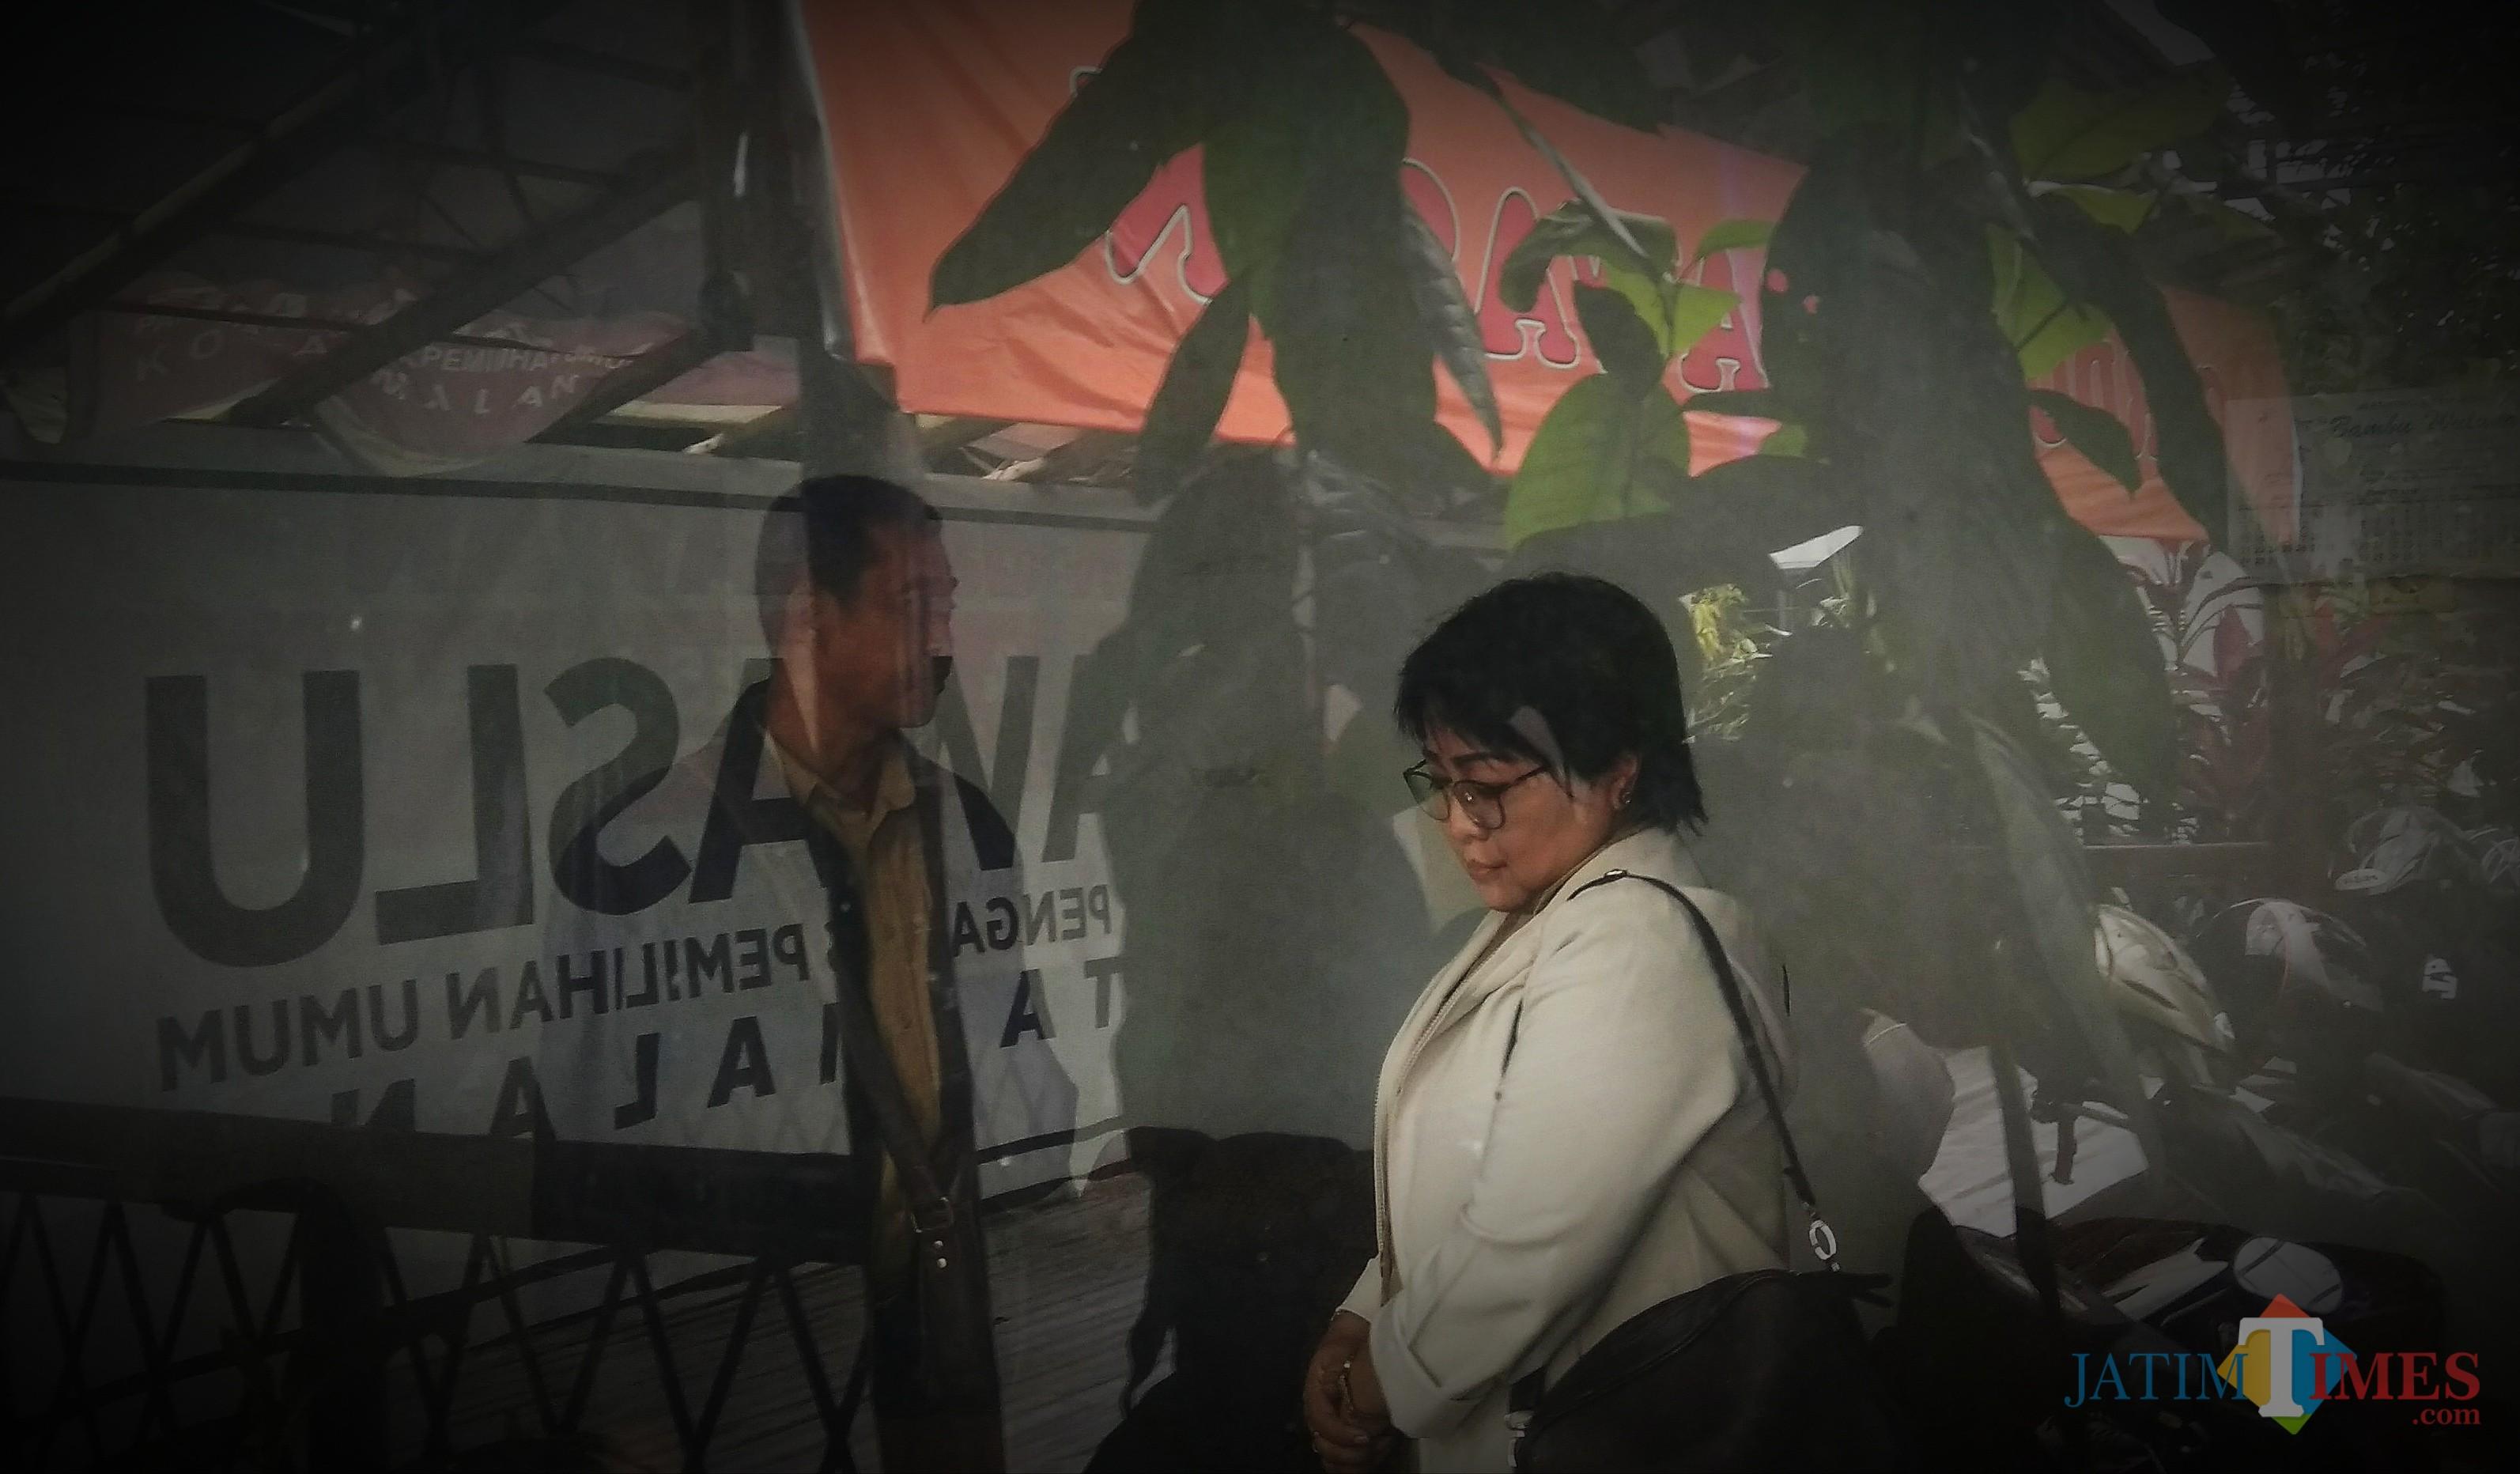 ASN Kota Malang atas nama Endang Sri Sundari saat hadir di kantor Bawaslu Kota Malang memenuhi undangan klarifikasi dugaan pelanggaran netralitas ASN. (Foto: Nurlayla Ratri/MalangTIMES)